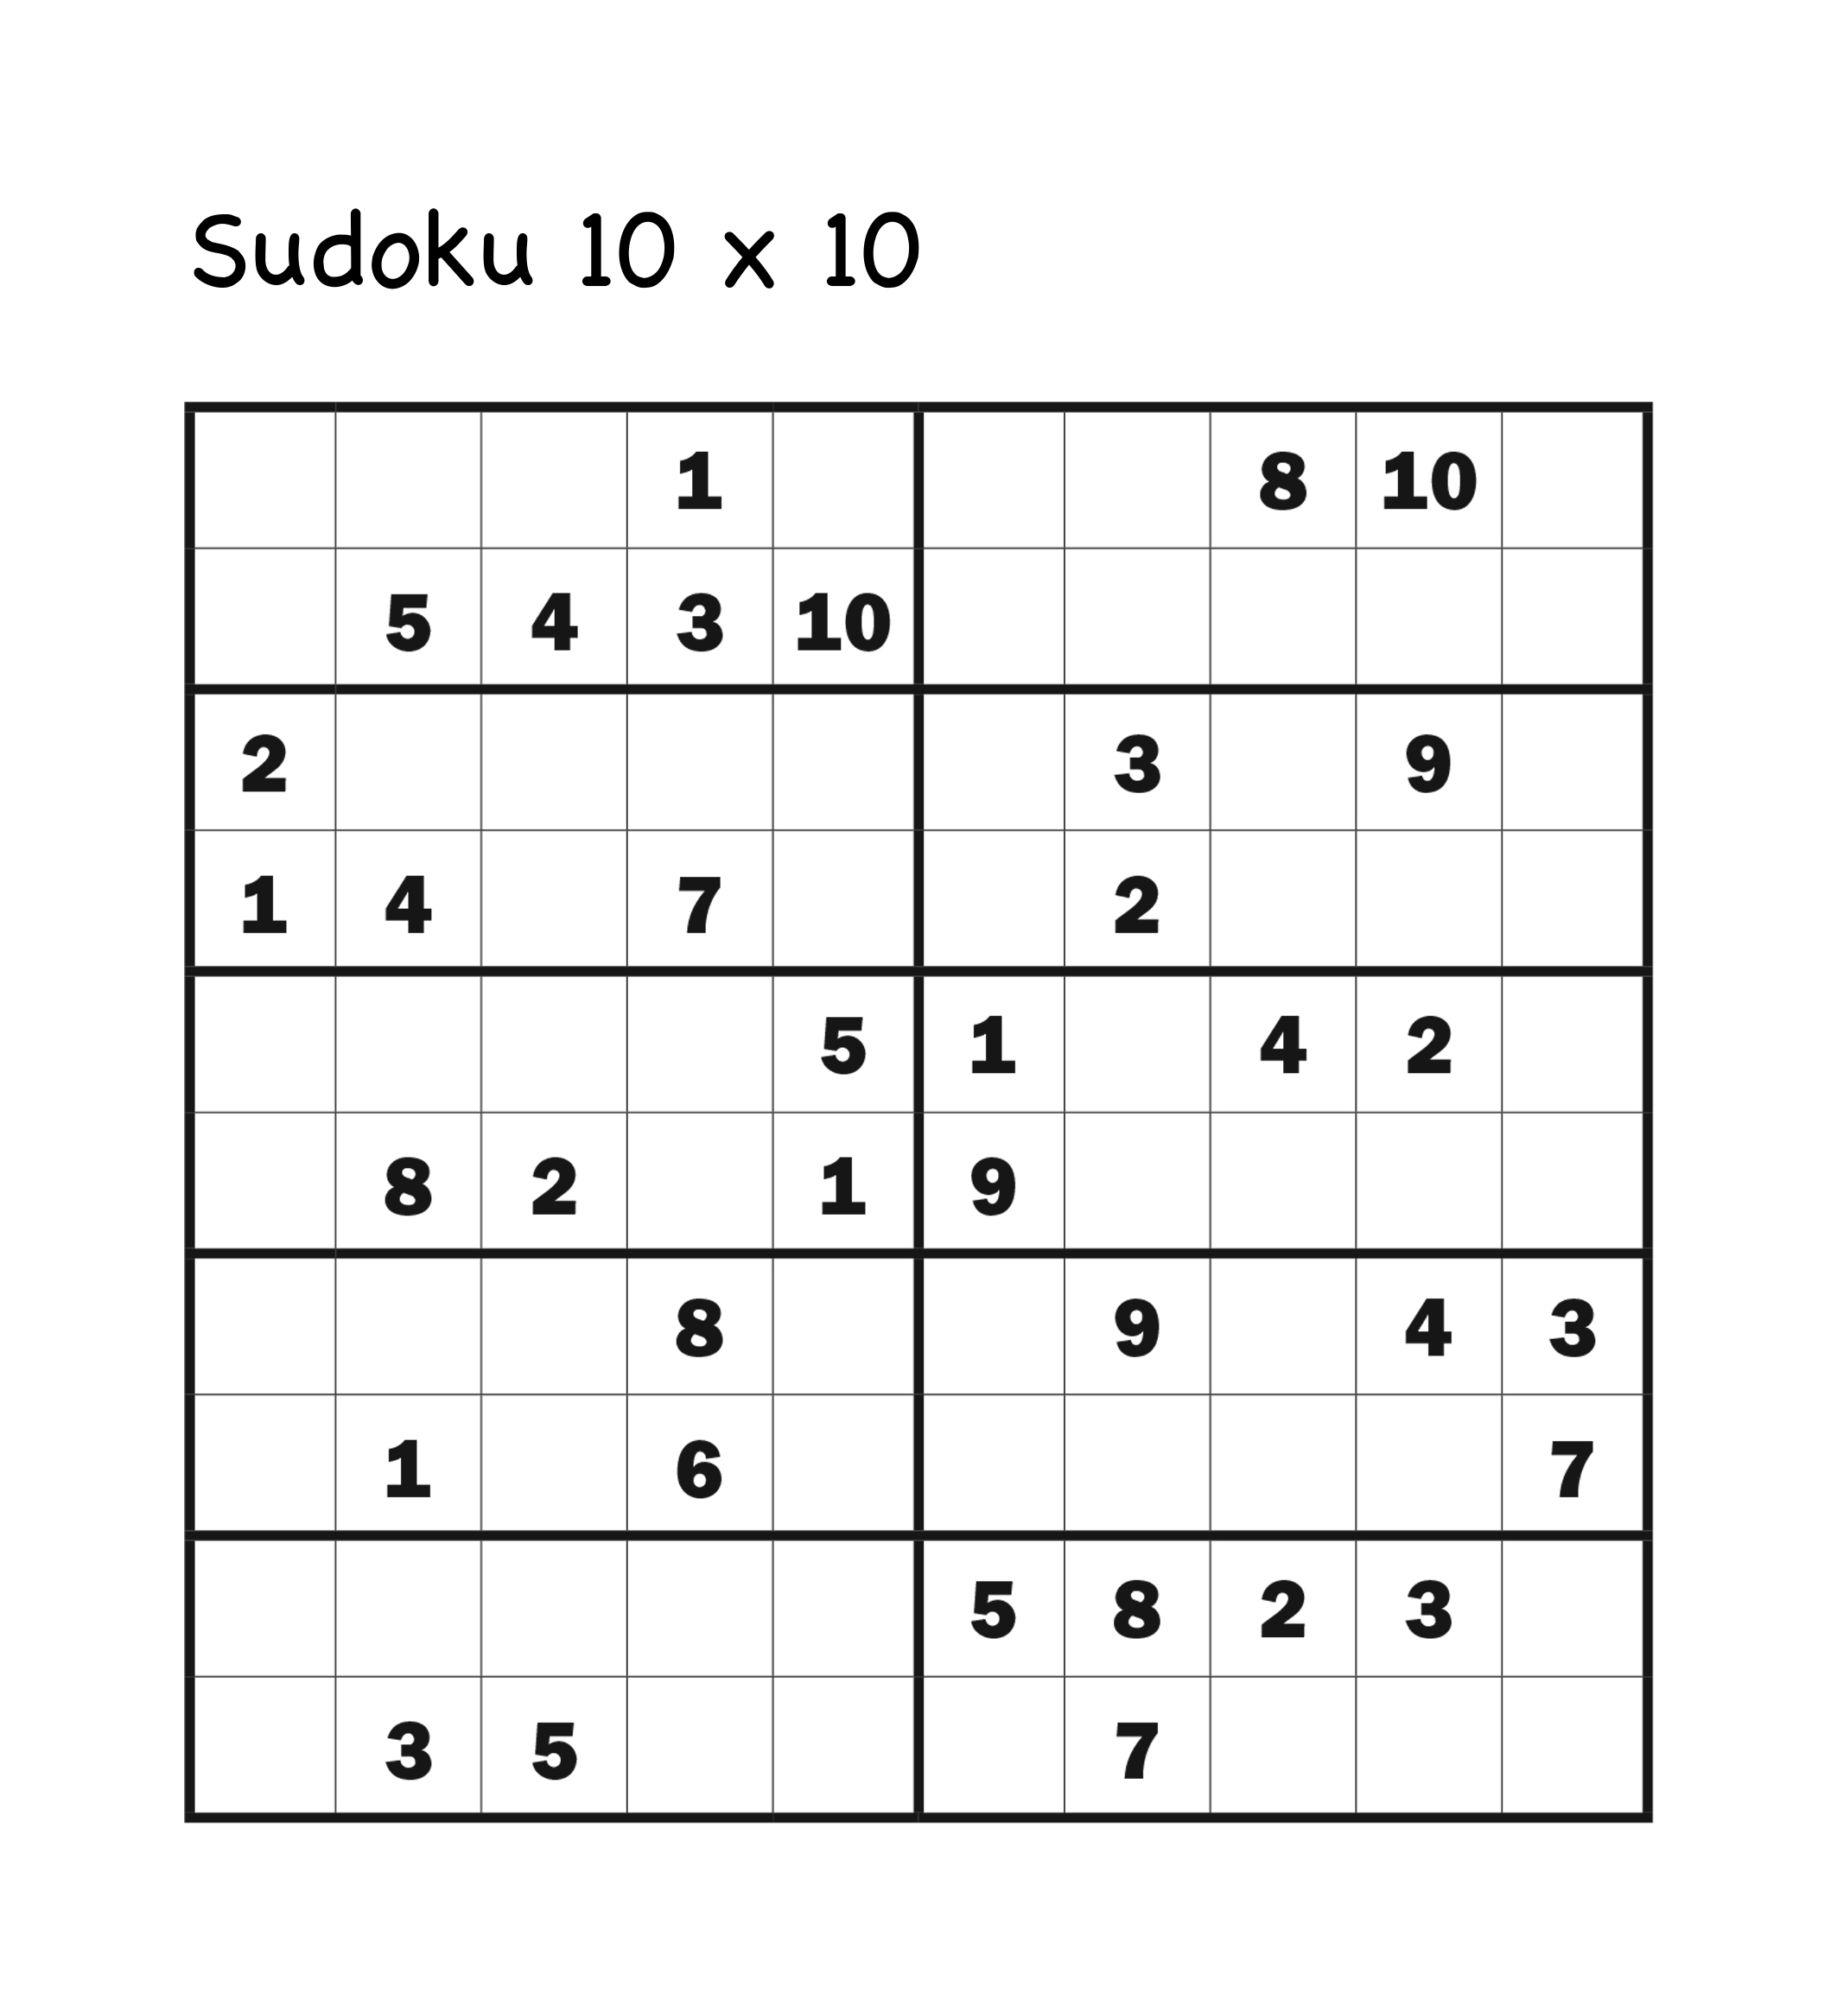 SUDOKU 10 x 10 Turpress